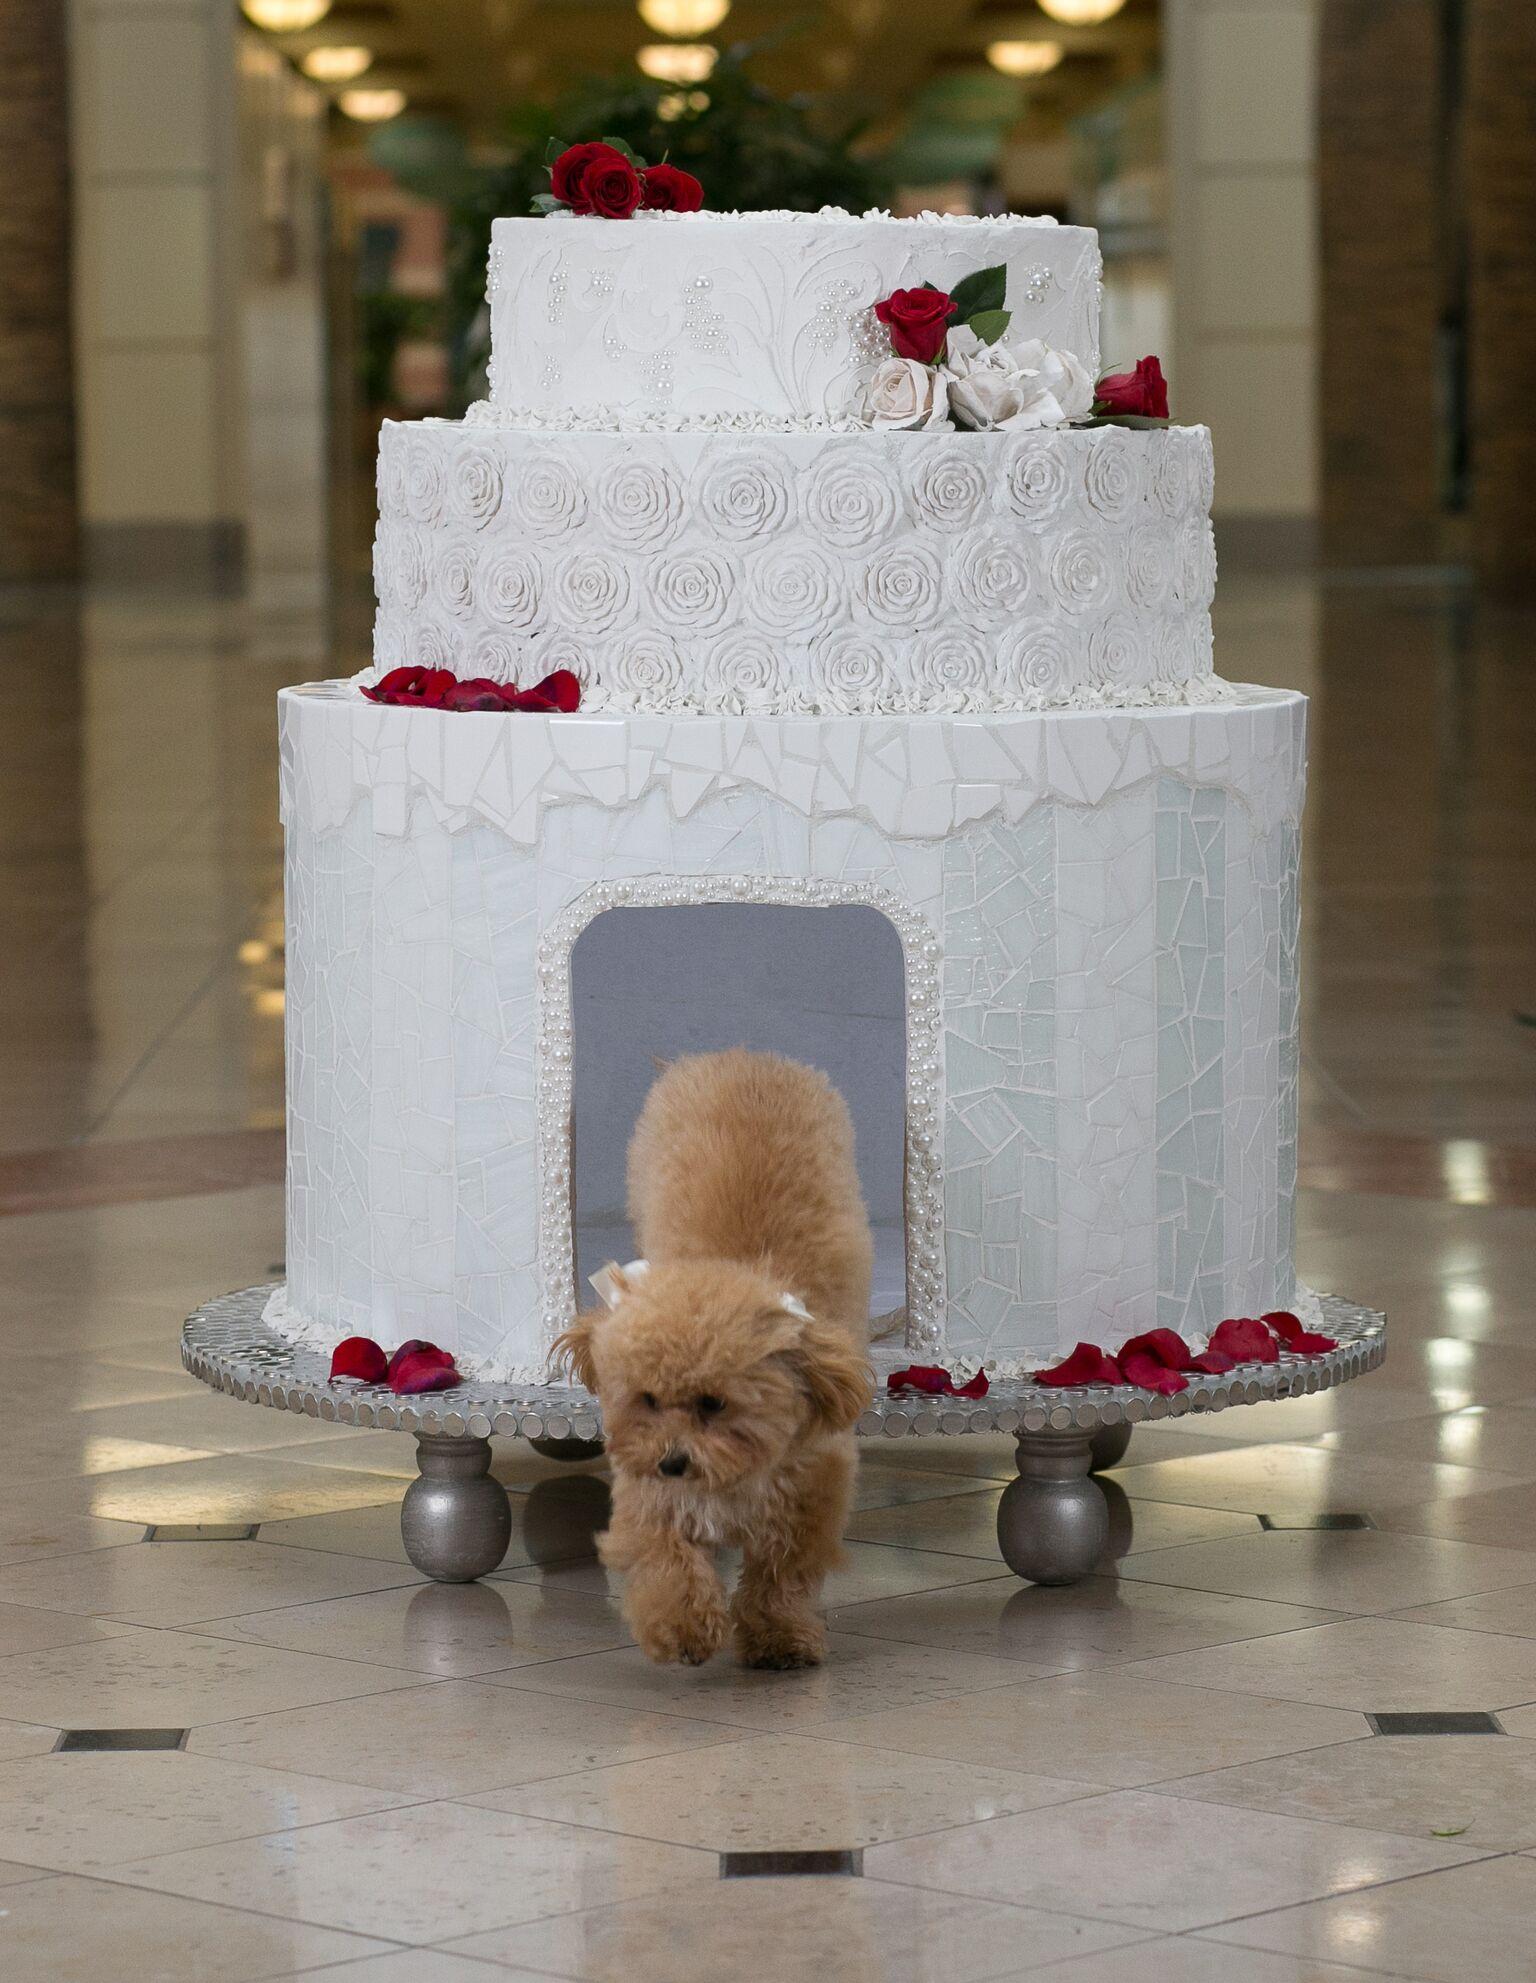 Jeff Monsein - The Royal Wedding Cake House - Image 2 of 9